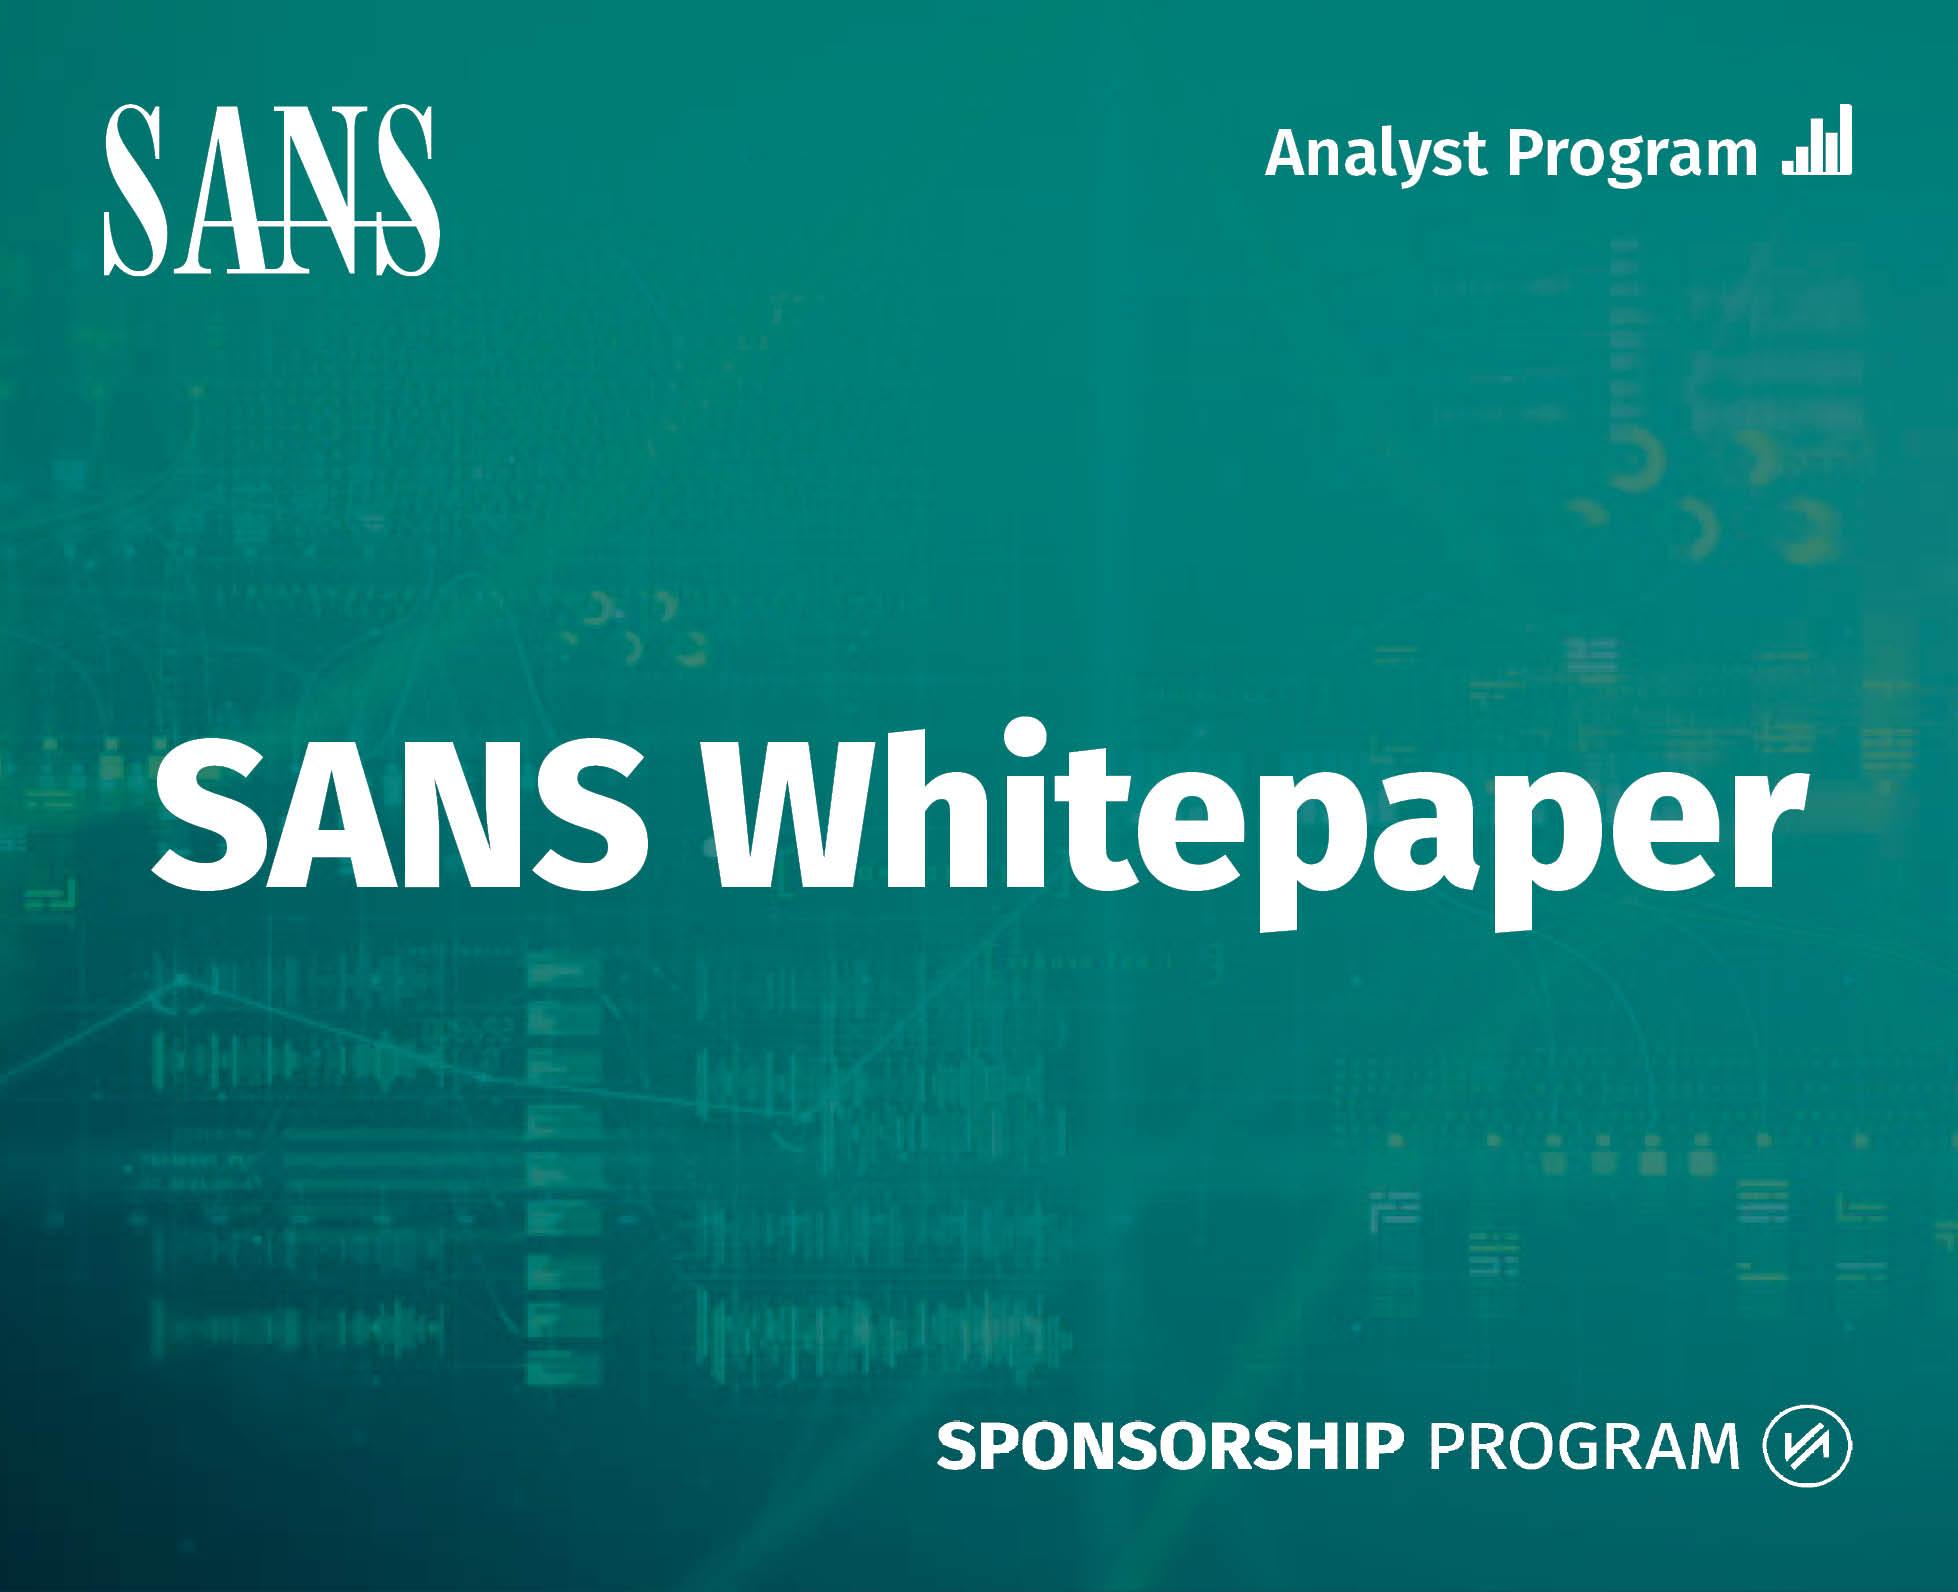 Analyst_Program_-_Whitepaper.jpg